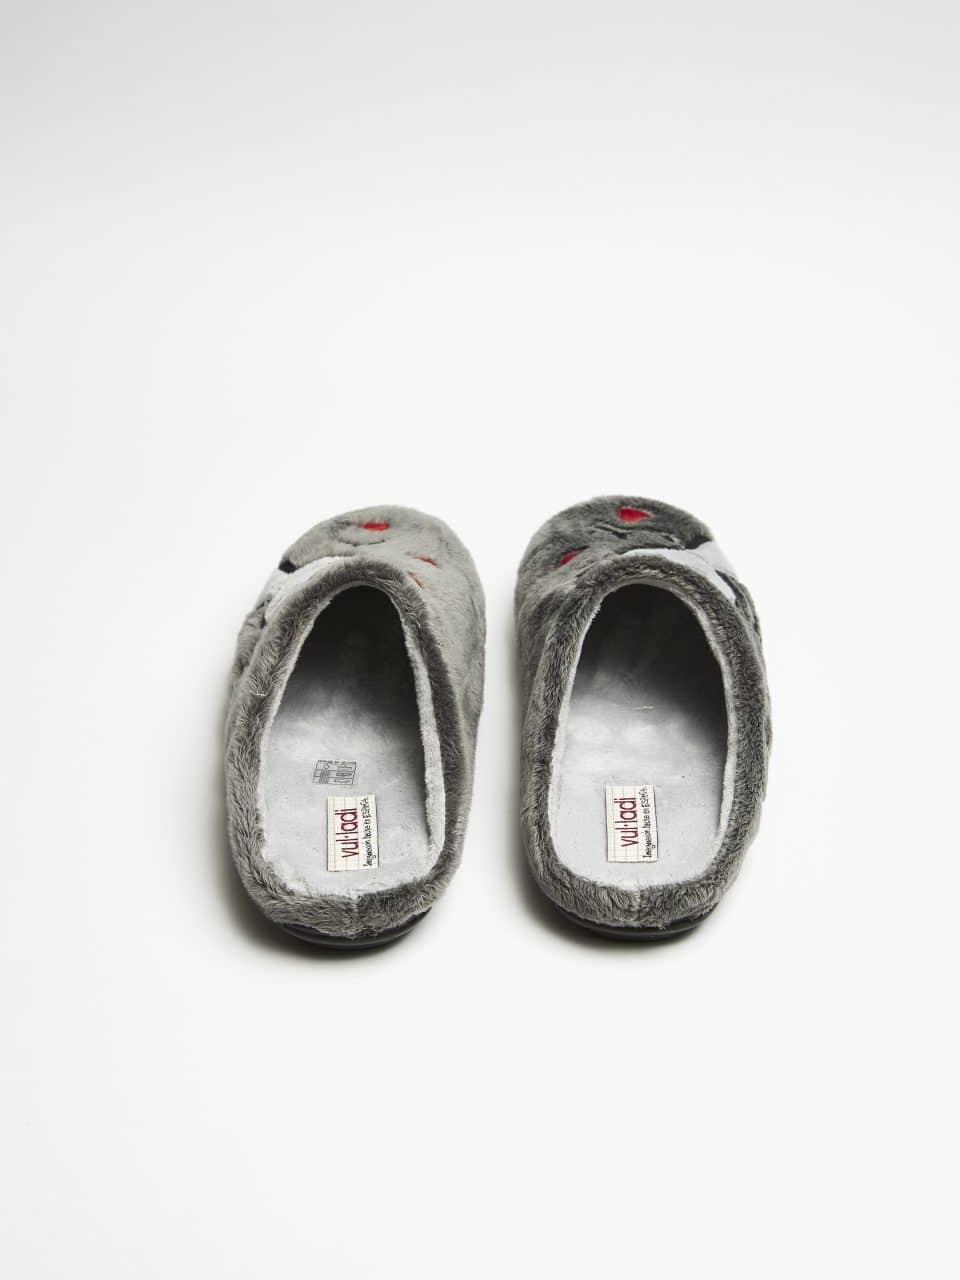 ZUECO NIÑOS MONTBLANC GRIS Marcas en Loyna Shoes